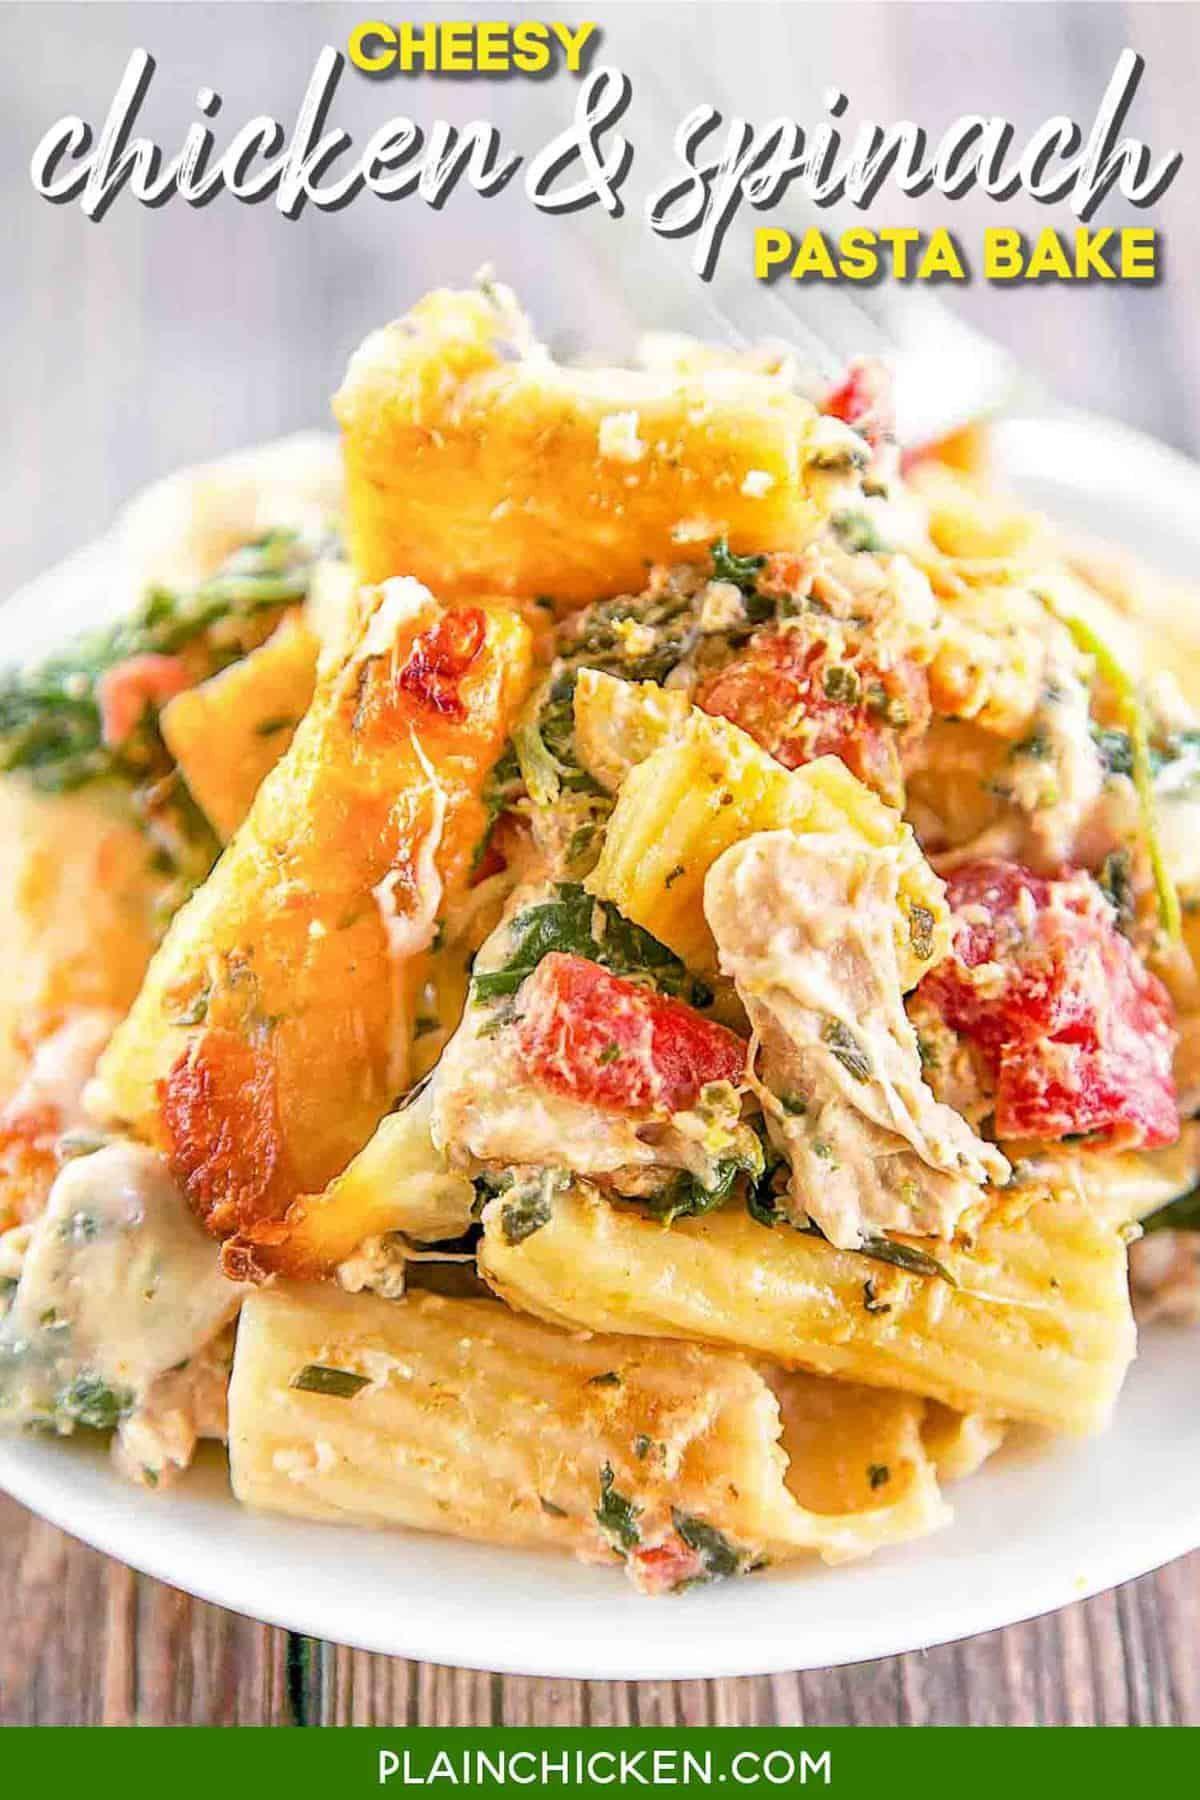 Cheesy Chicken And Spinach Pasta Bake Pasta Onion Spinach Chicken Tomatoes Chive And Onion In 2020 Quick Chicken Recipes Plain Chicken Recipe Spinach Pasta Bake